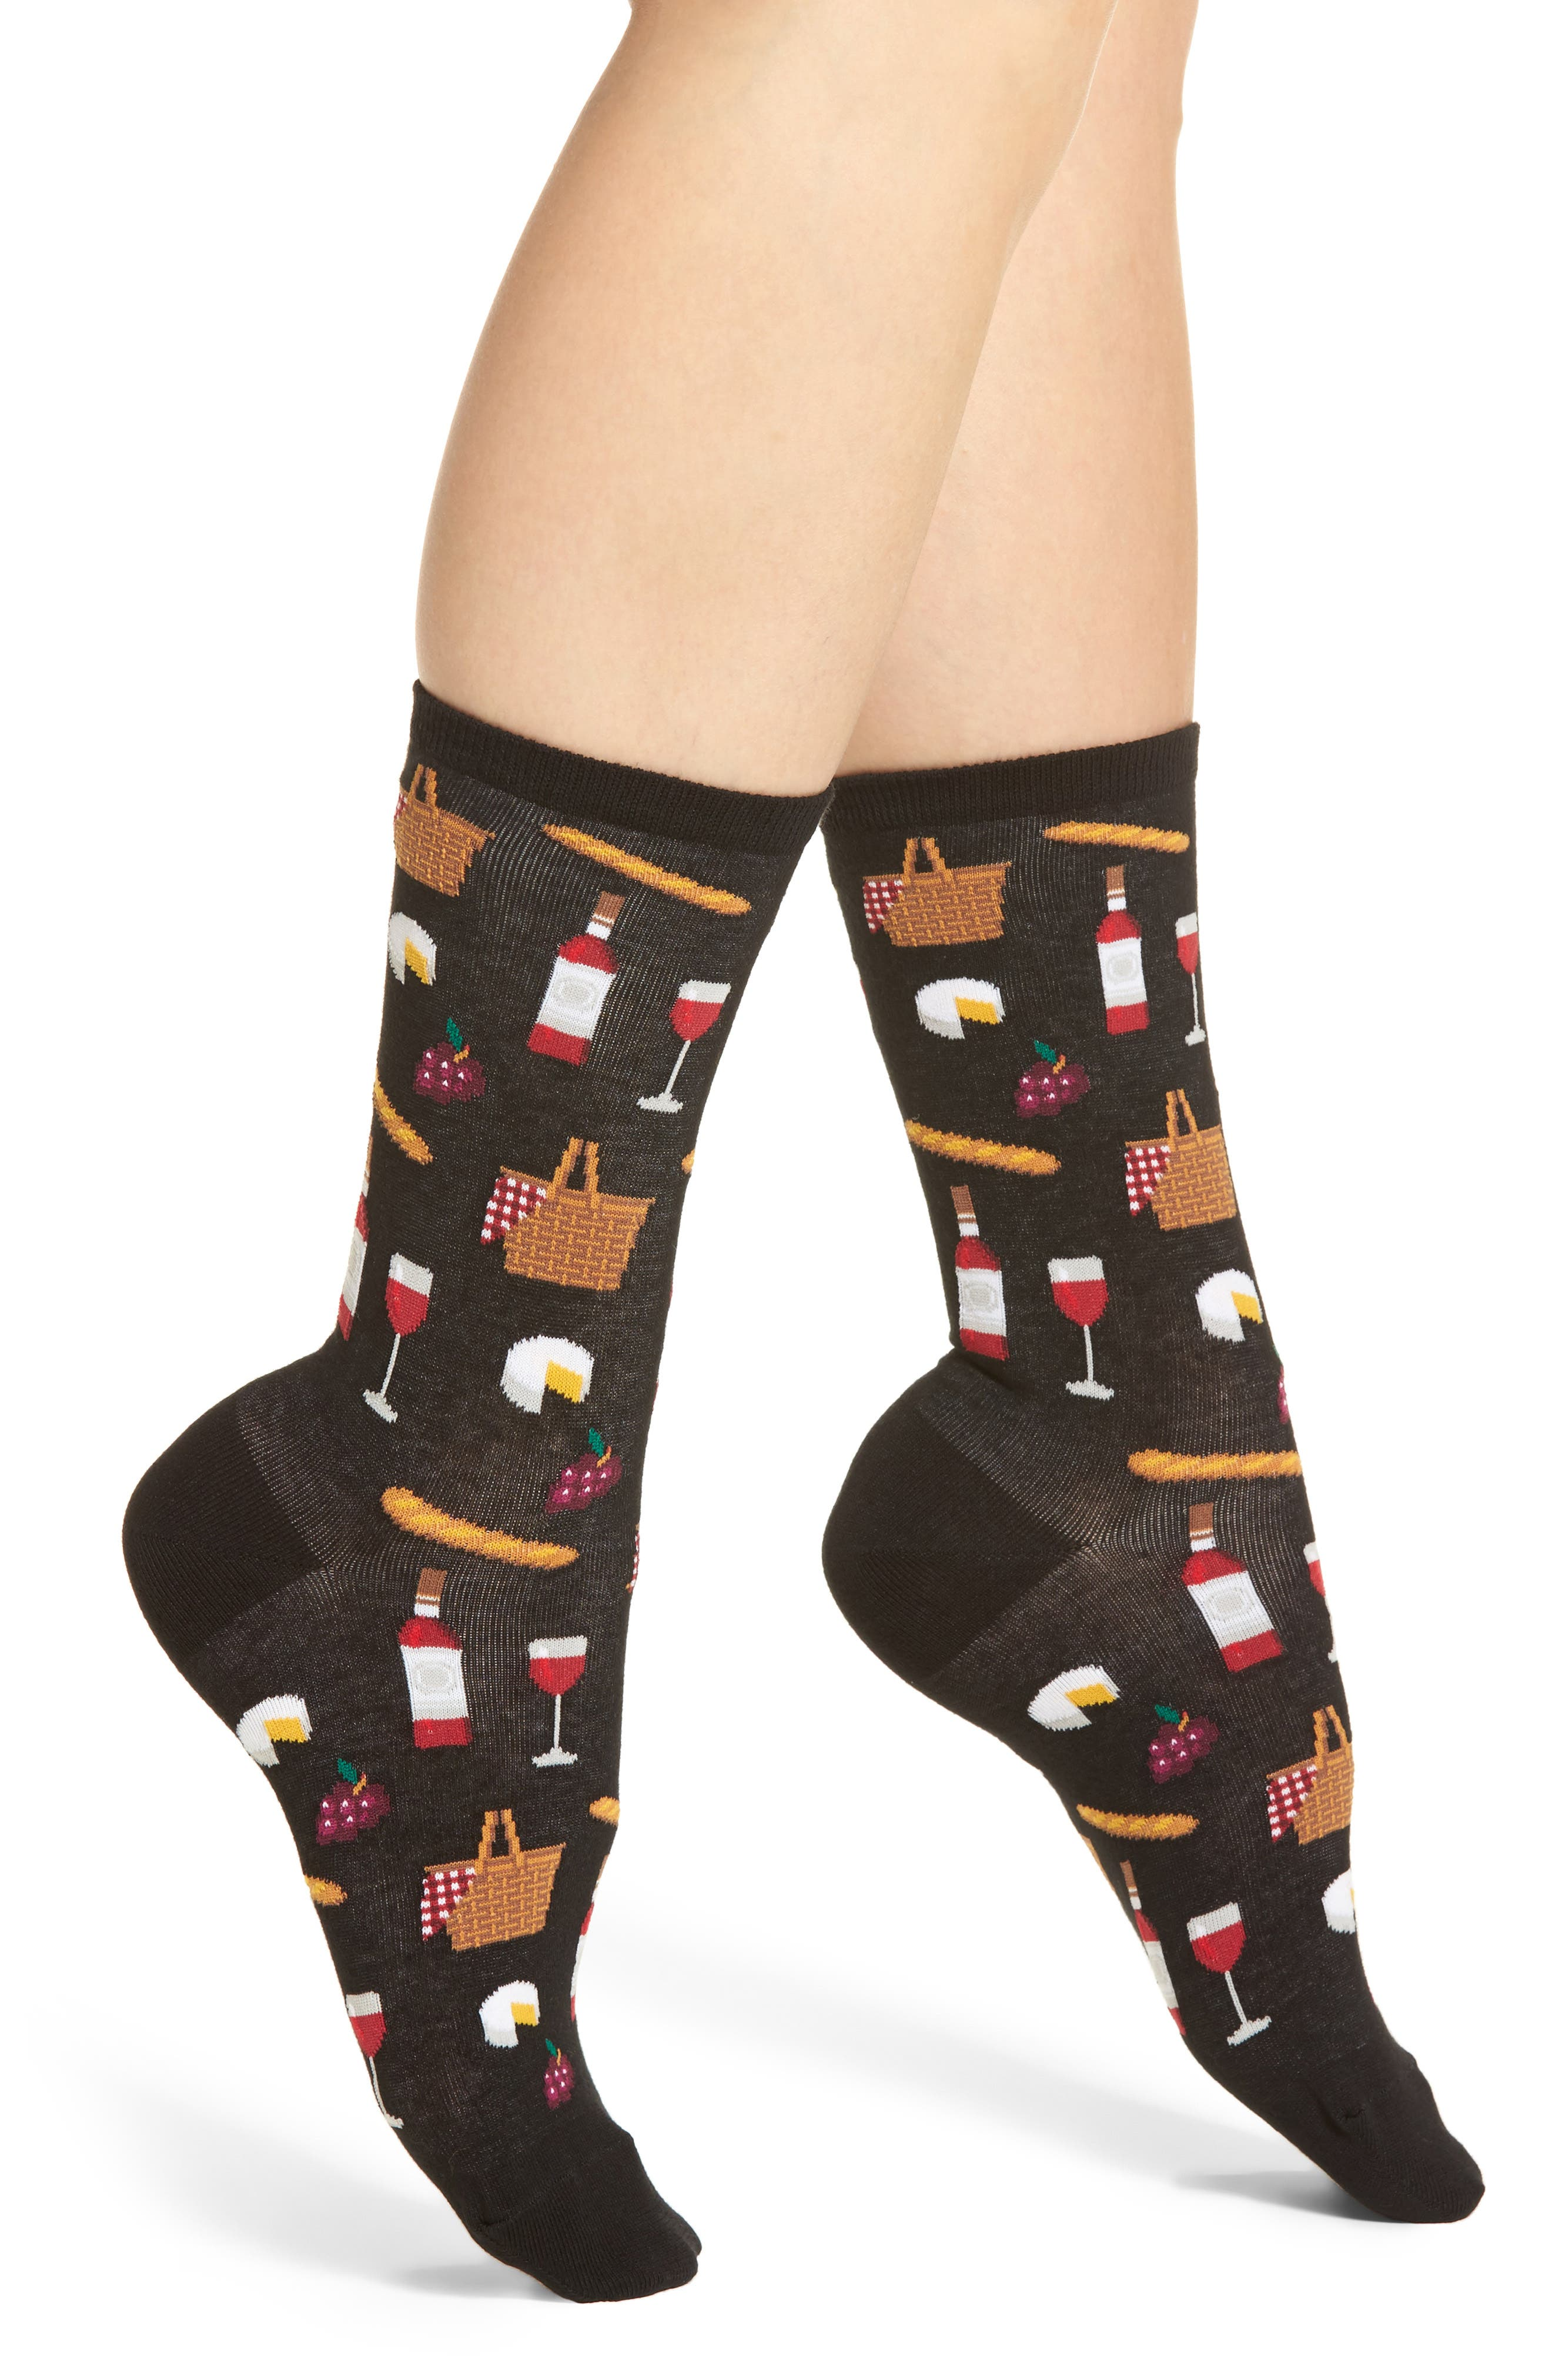 Hot Sox Picnic Crew Socks